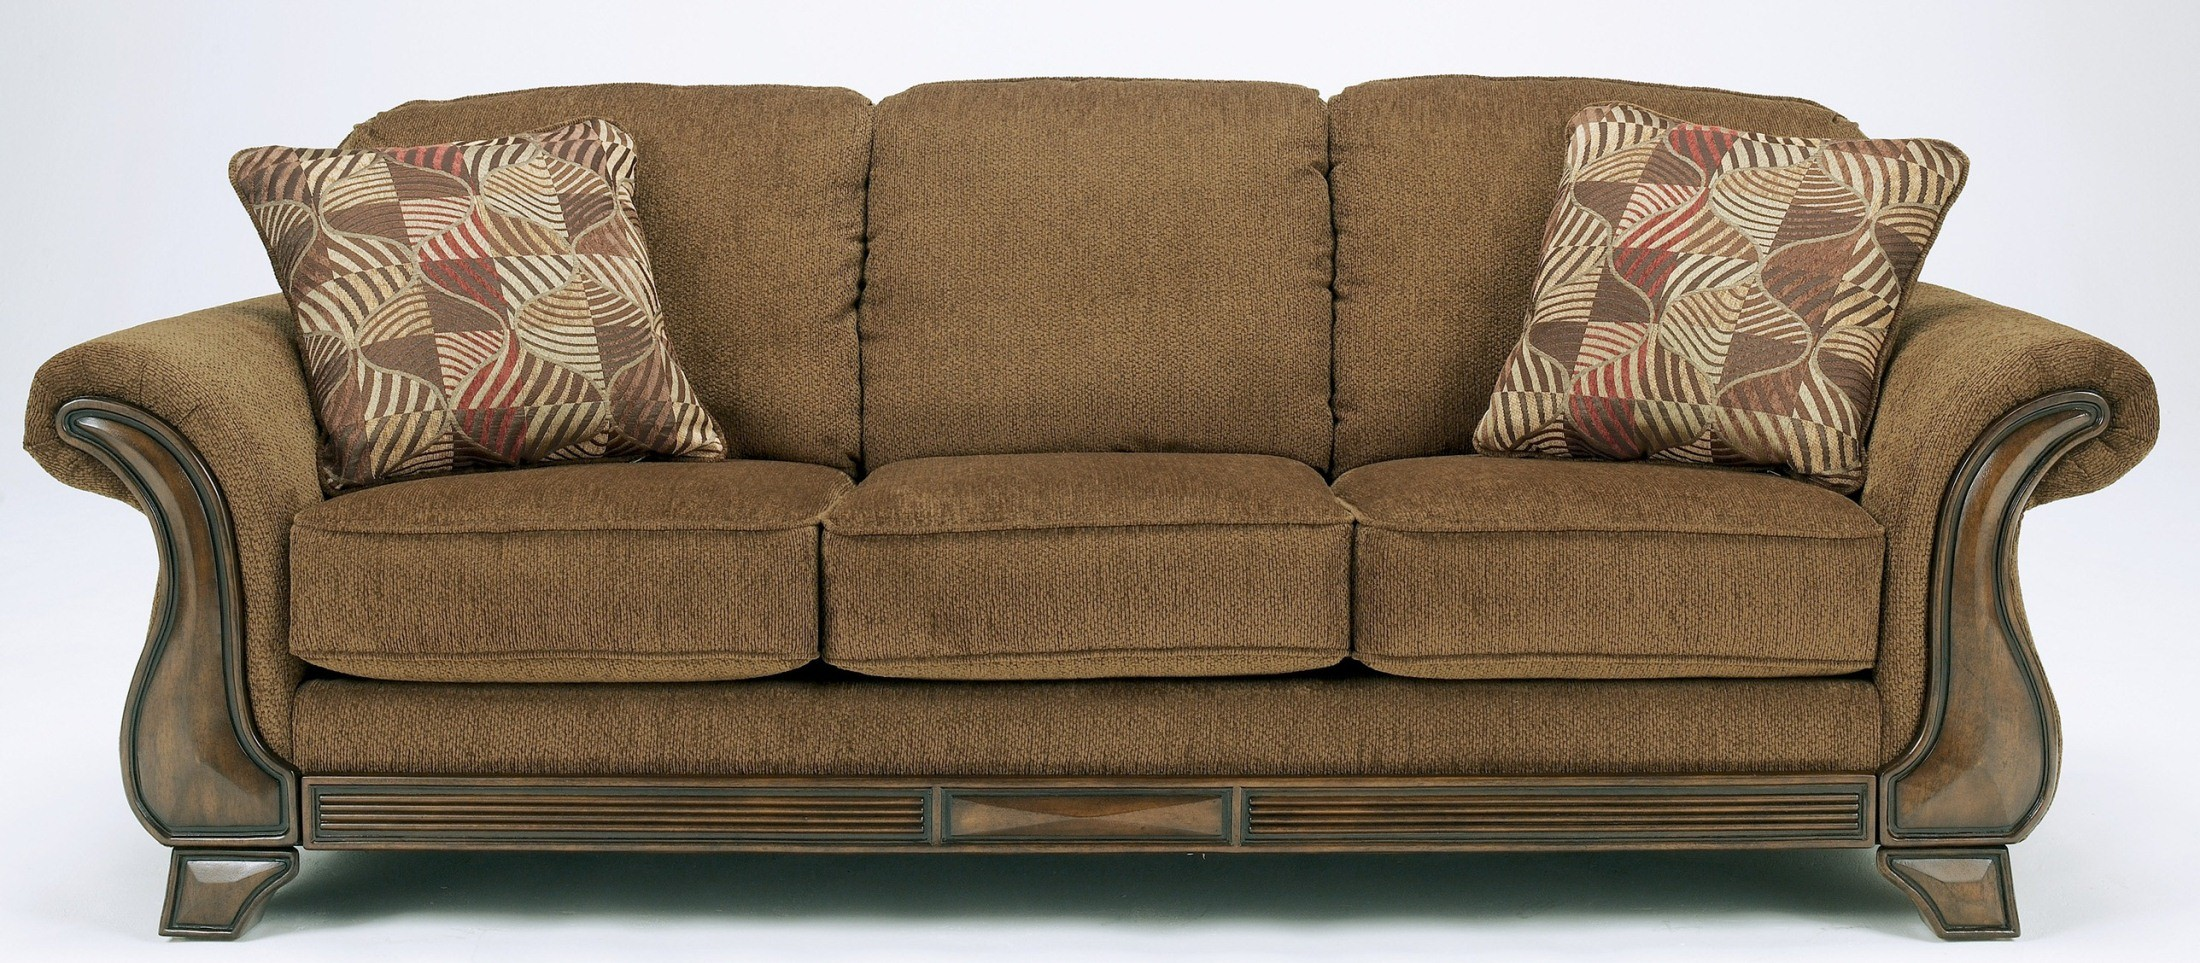 ashley sleeper sofa voyager lay flat reclining montgomery mocha queen 3830039 furniture